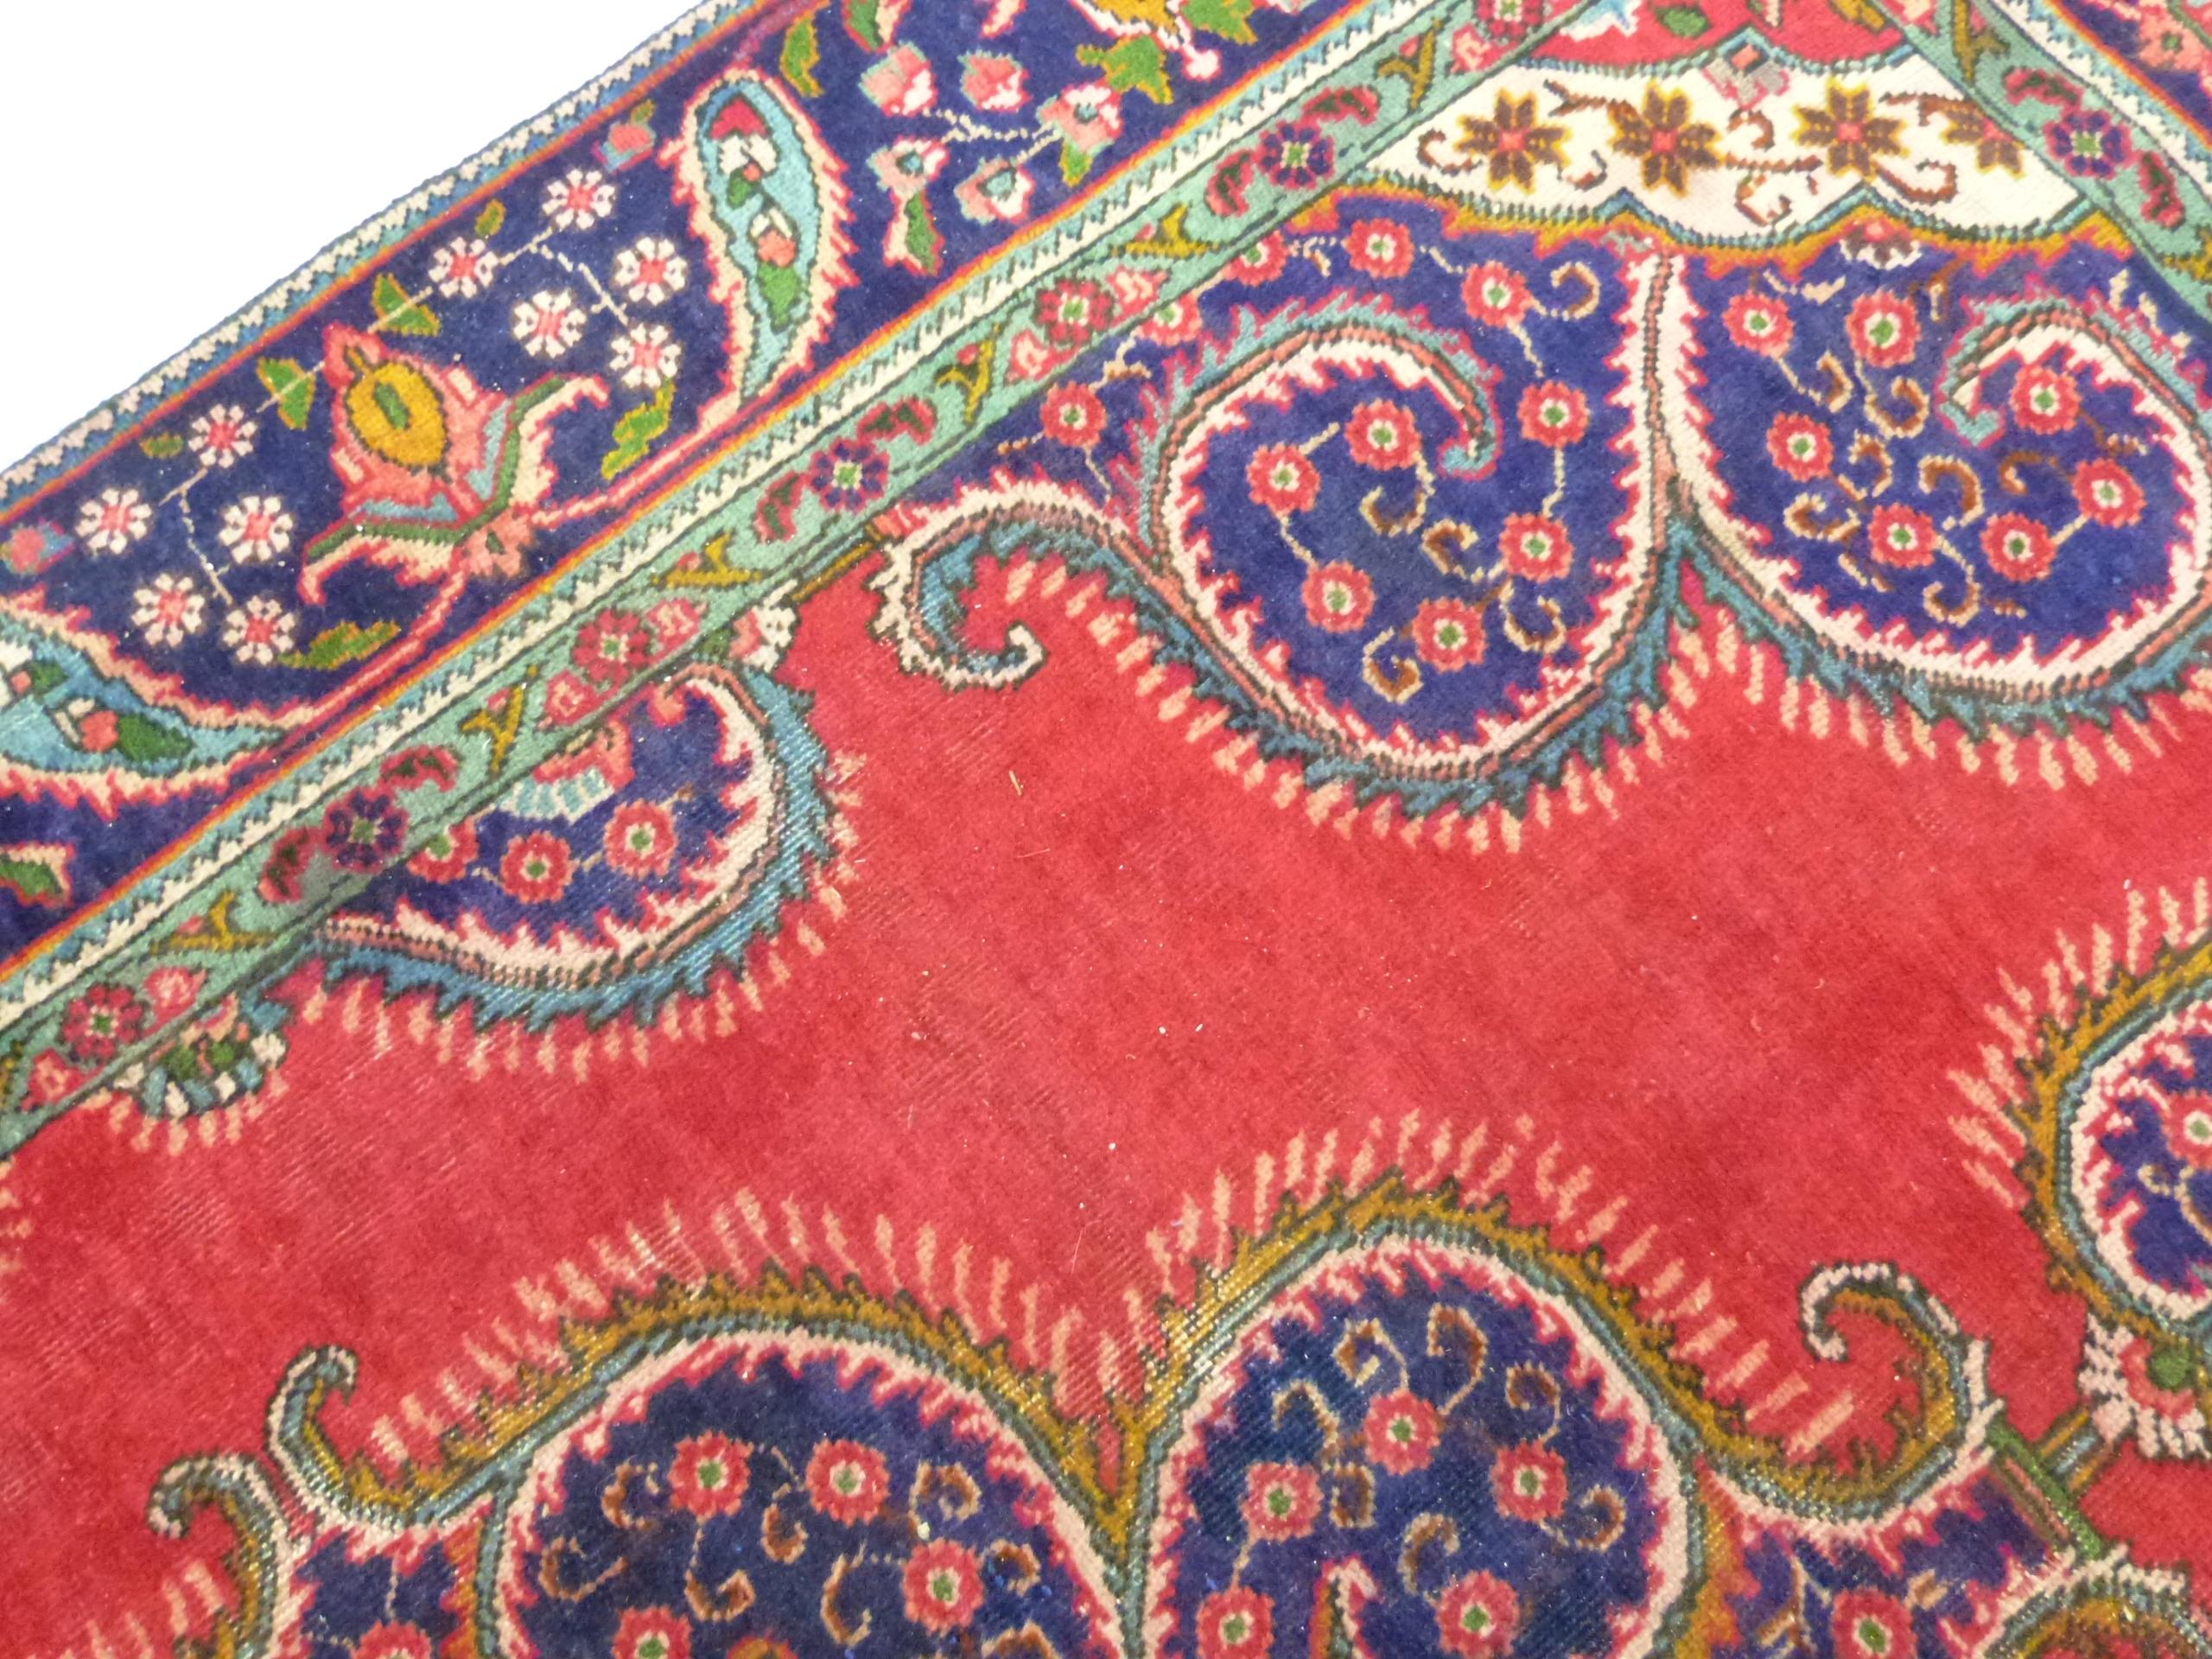 Deep ground thick pile Persian Narouan Carpet,decorated with various motifs & symbols 276cm x - Image 5 of 9